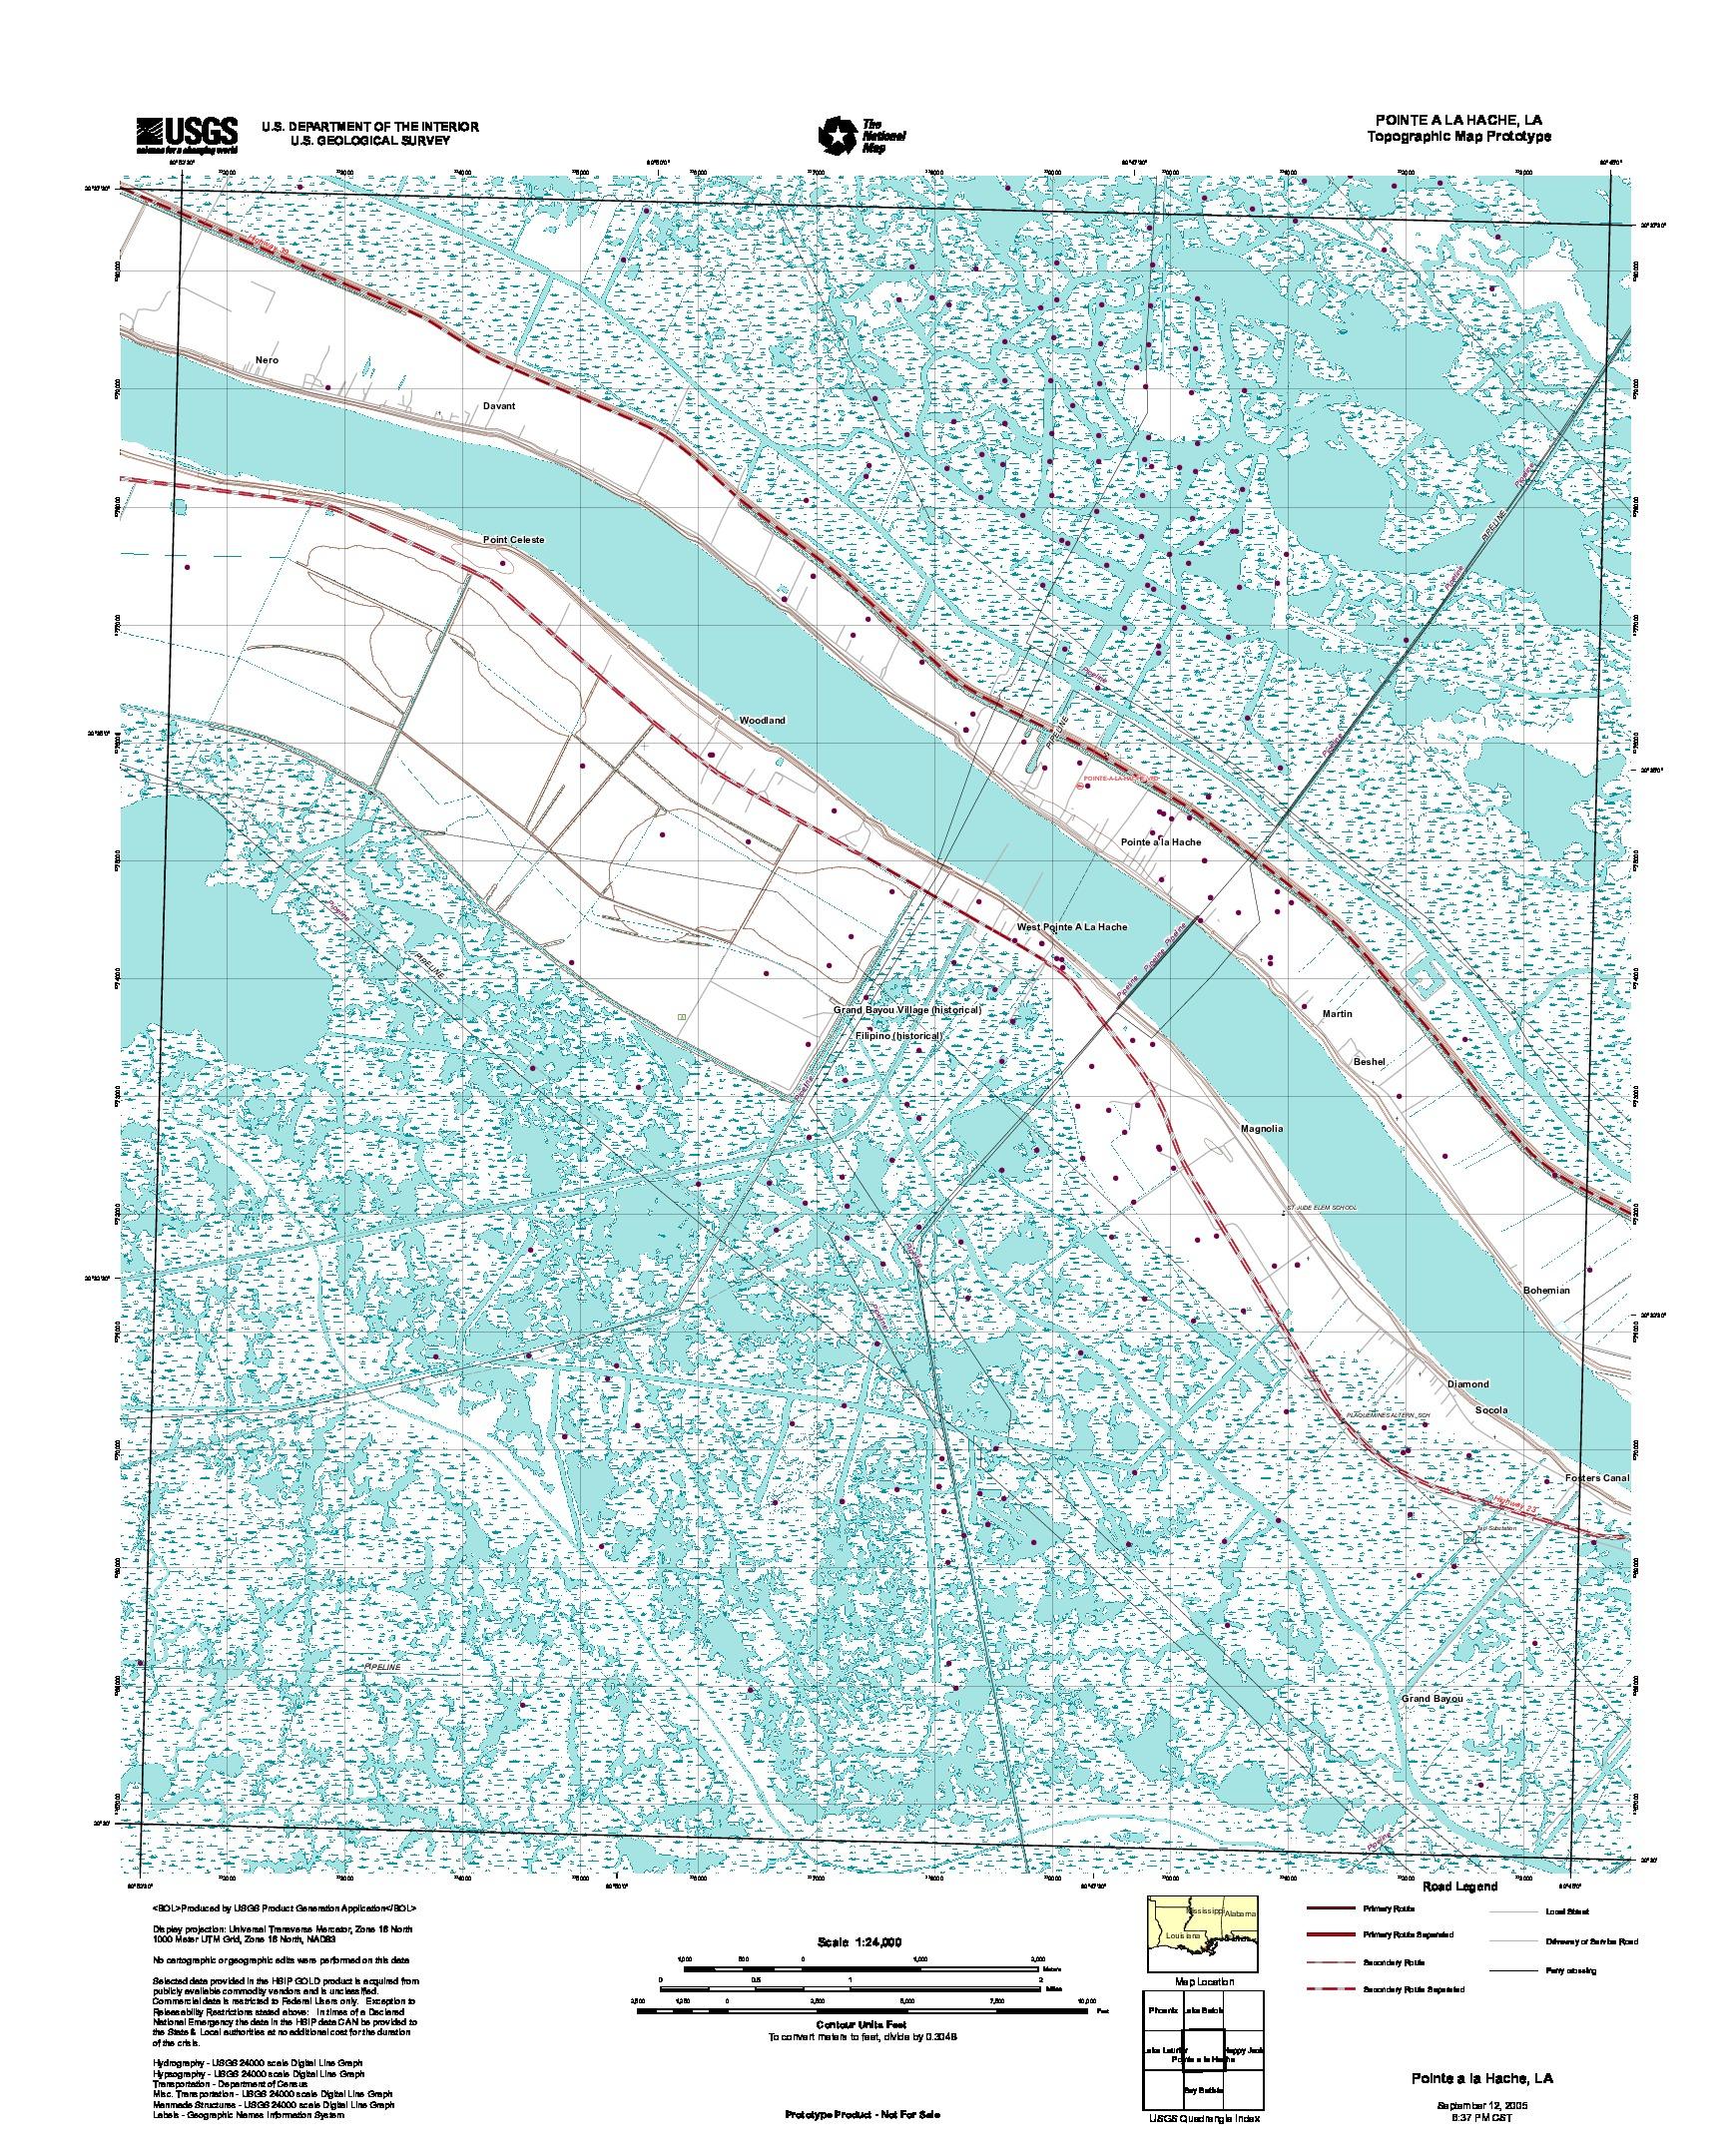 Pointe a la Hache, Topographic Map Prototype, Louisiana, United States, September 12, 2005